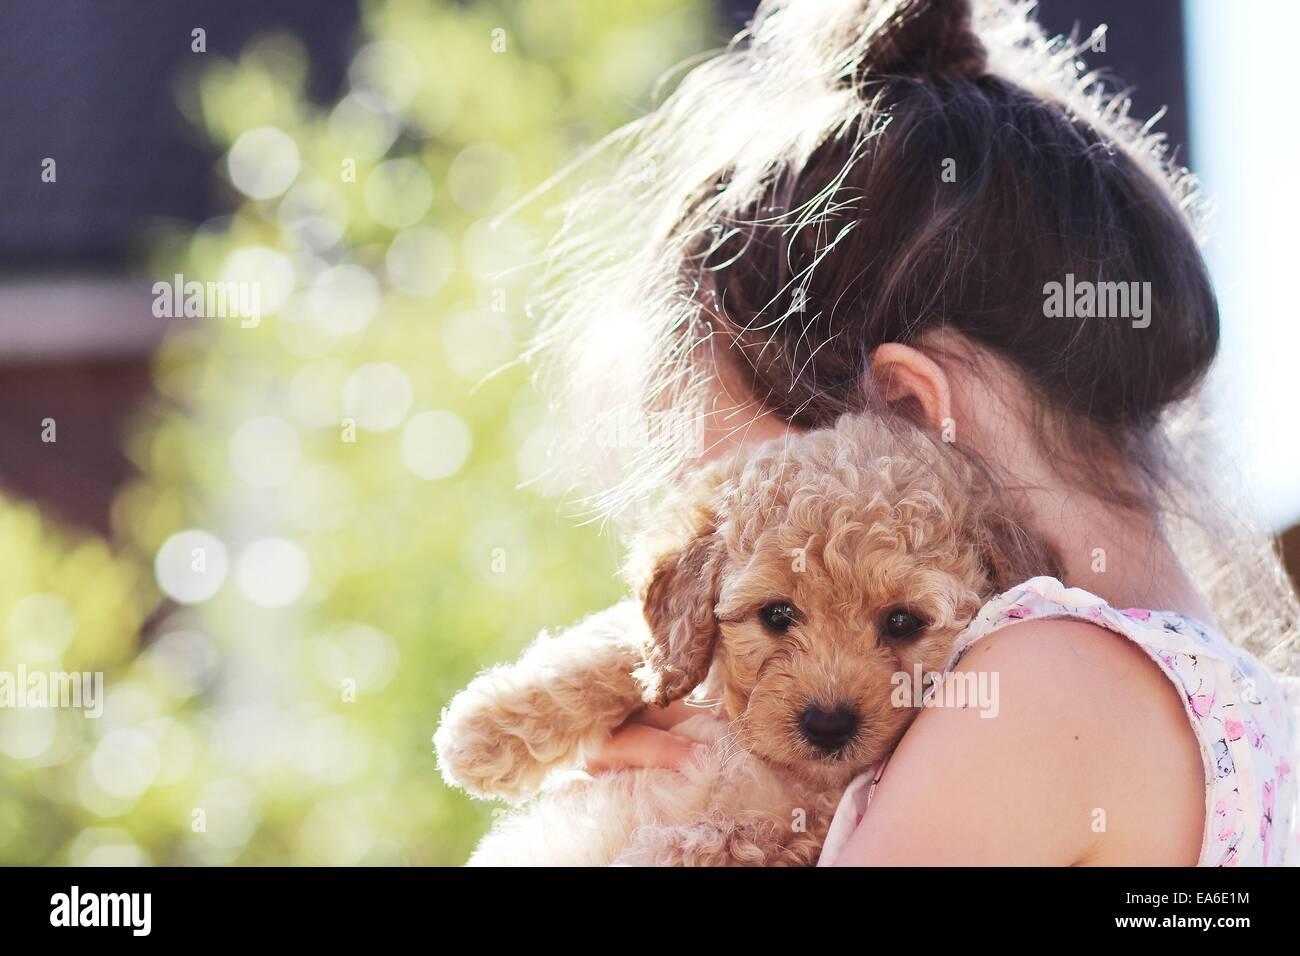 Girl cuddling her puppy dog - Stock Image